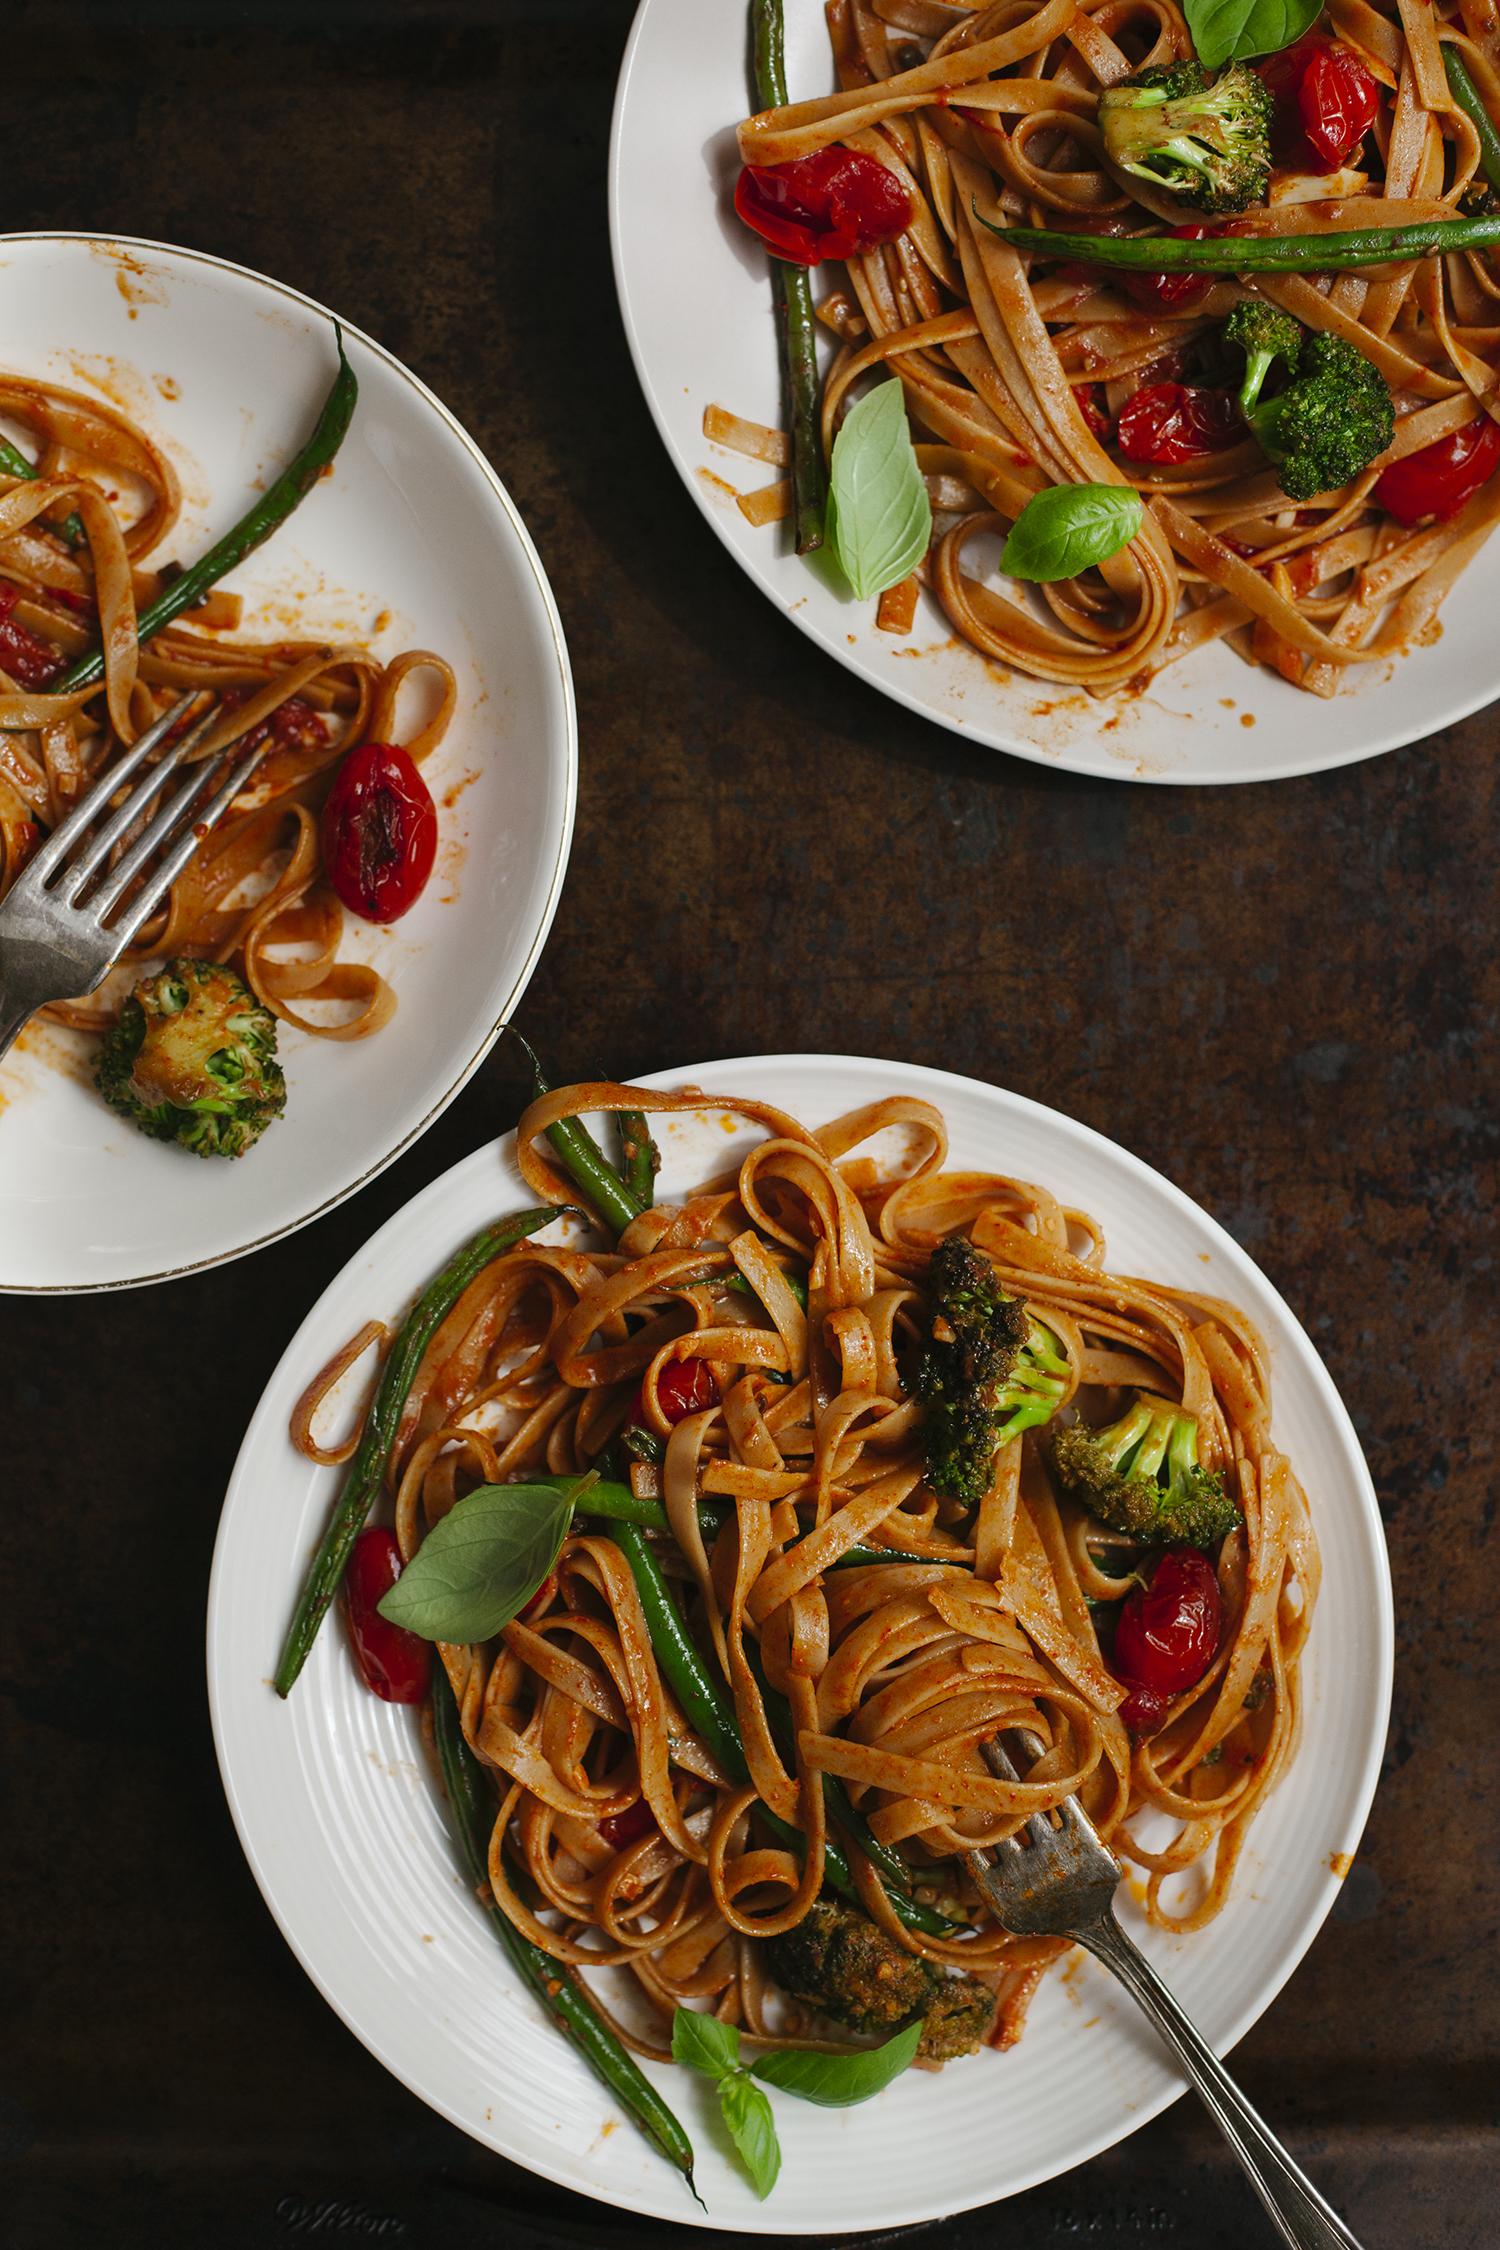 Simply Vibrant, a new cookbook by Anya Kassoff and Masha Davydova